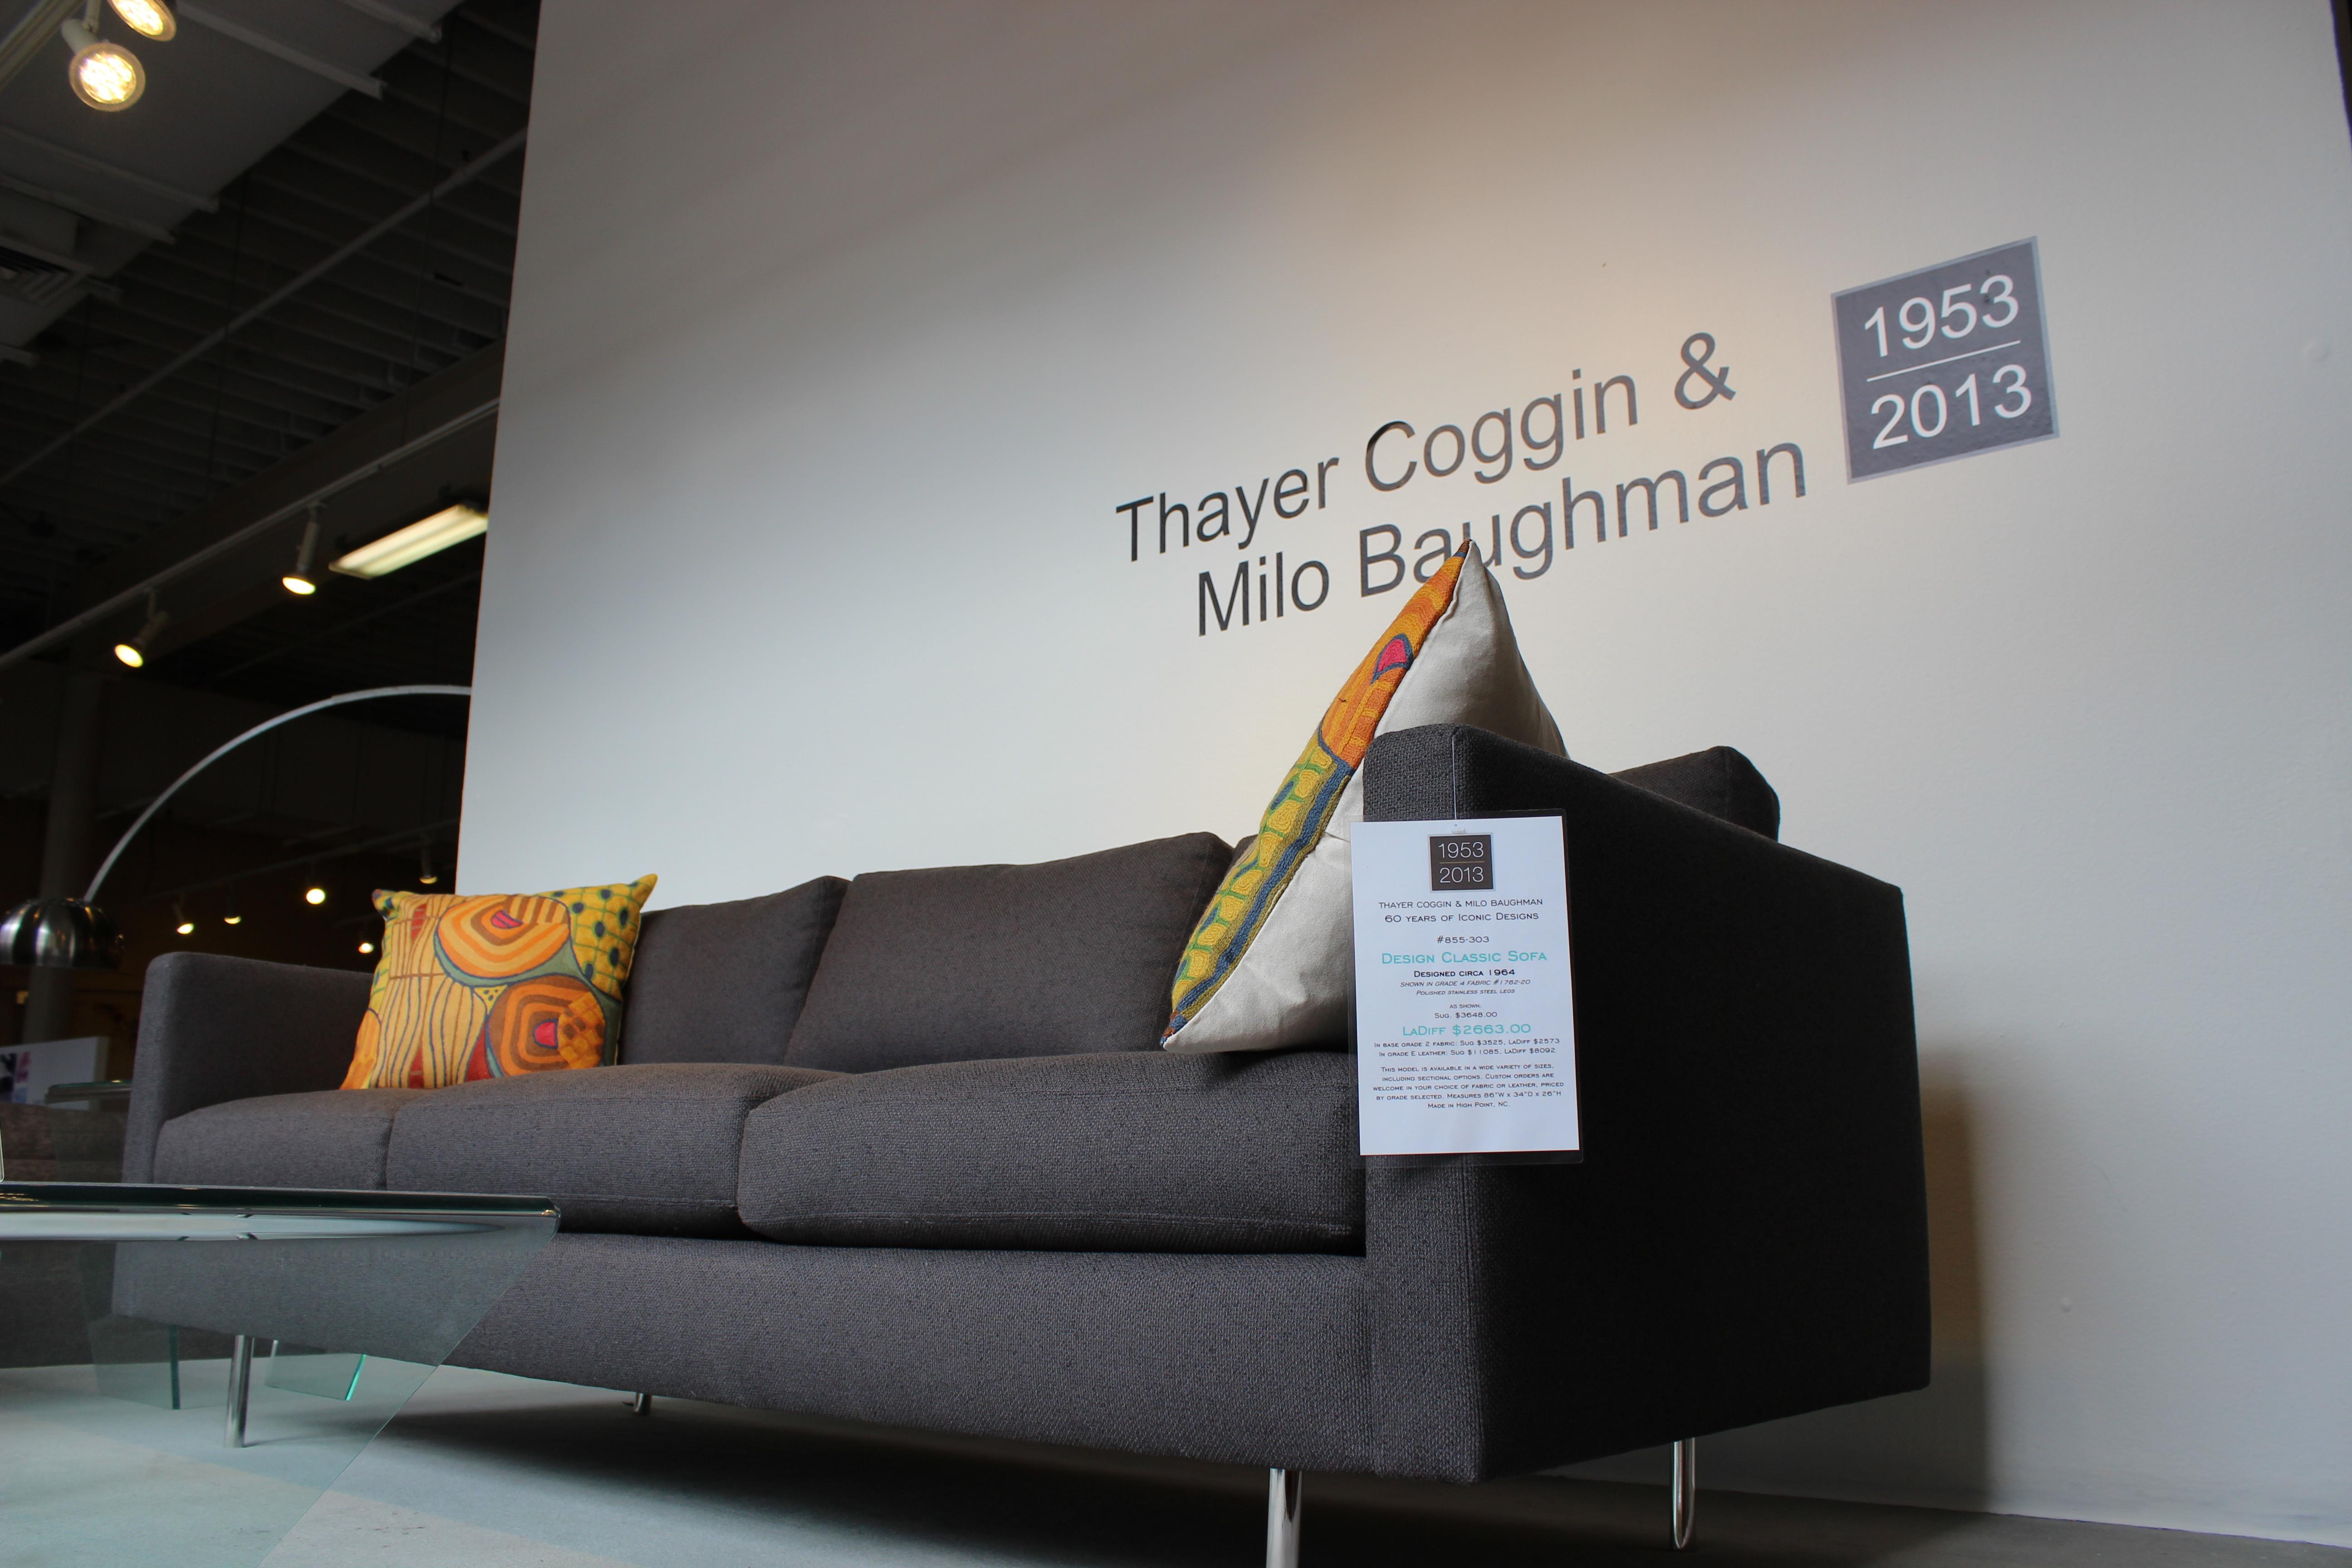 Milo Baughman Thayer Coggin Mod Furniture Exhibit at LaDiff